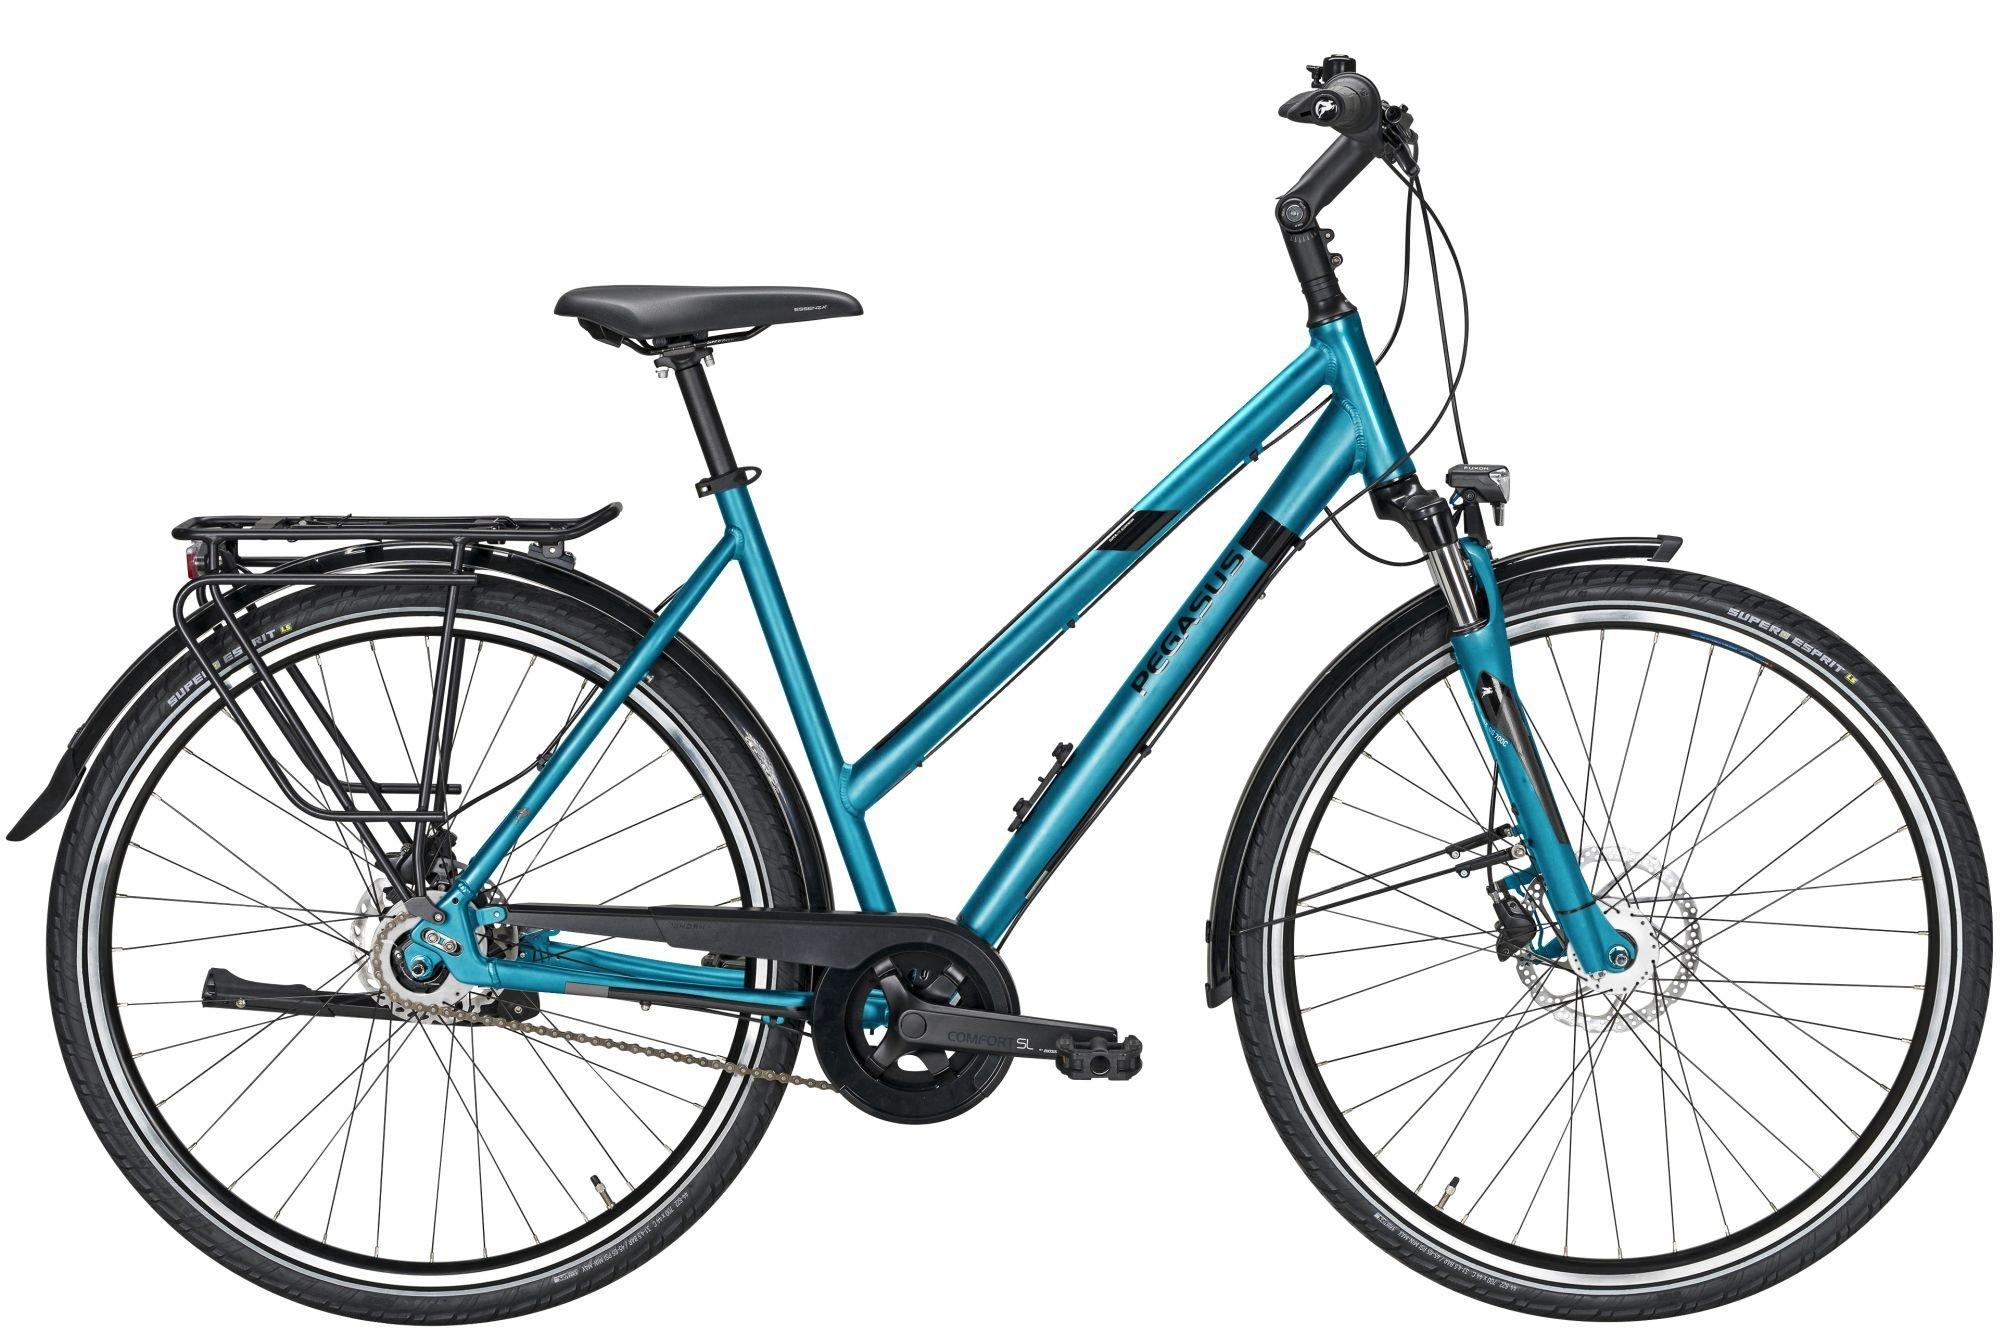 city-/tourenräder/Citybikes: Pegasus  Savona SL Disc 8 8 Gang Nabenschaltung Damenfahrrad Trapez Modell 2021 28 Zoll 53 cm